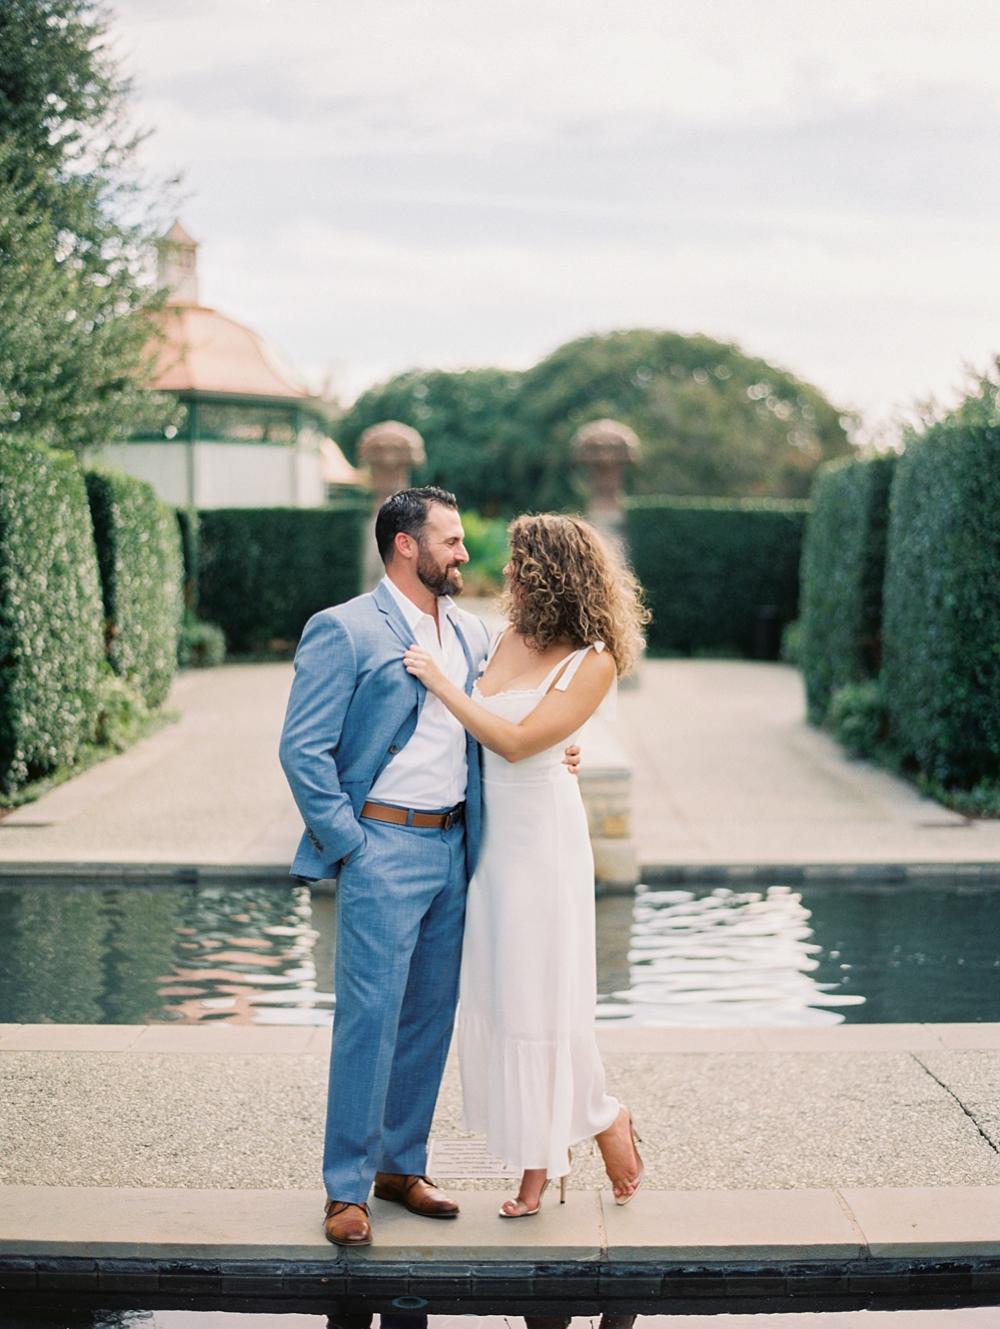 kristin-la-voie-photography-Dallas-Botanical-Garden-Arboretum-Engagement-fine-art-wedding-photographer-98